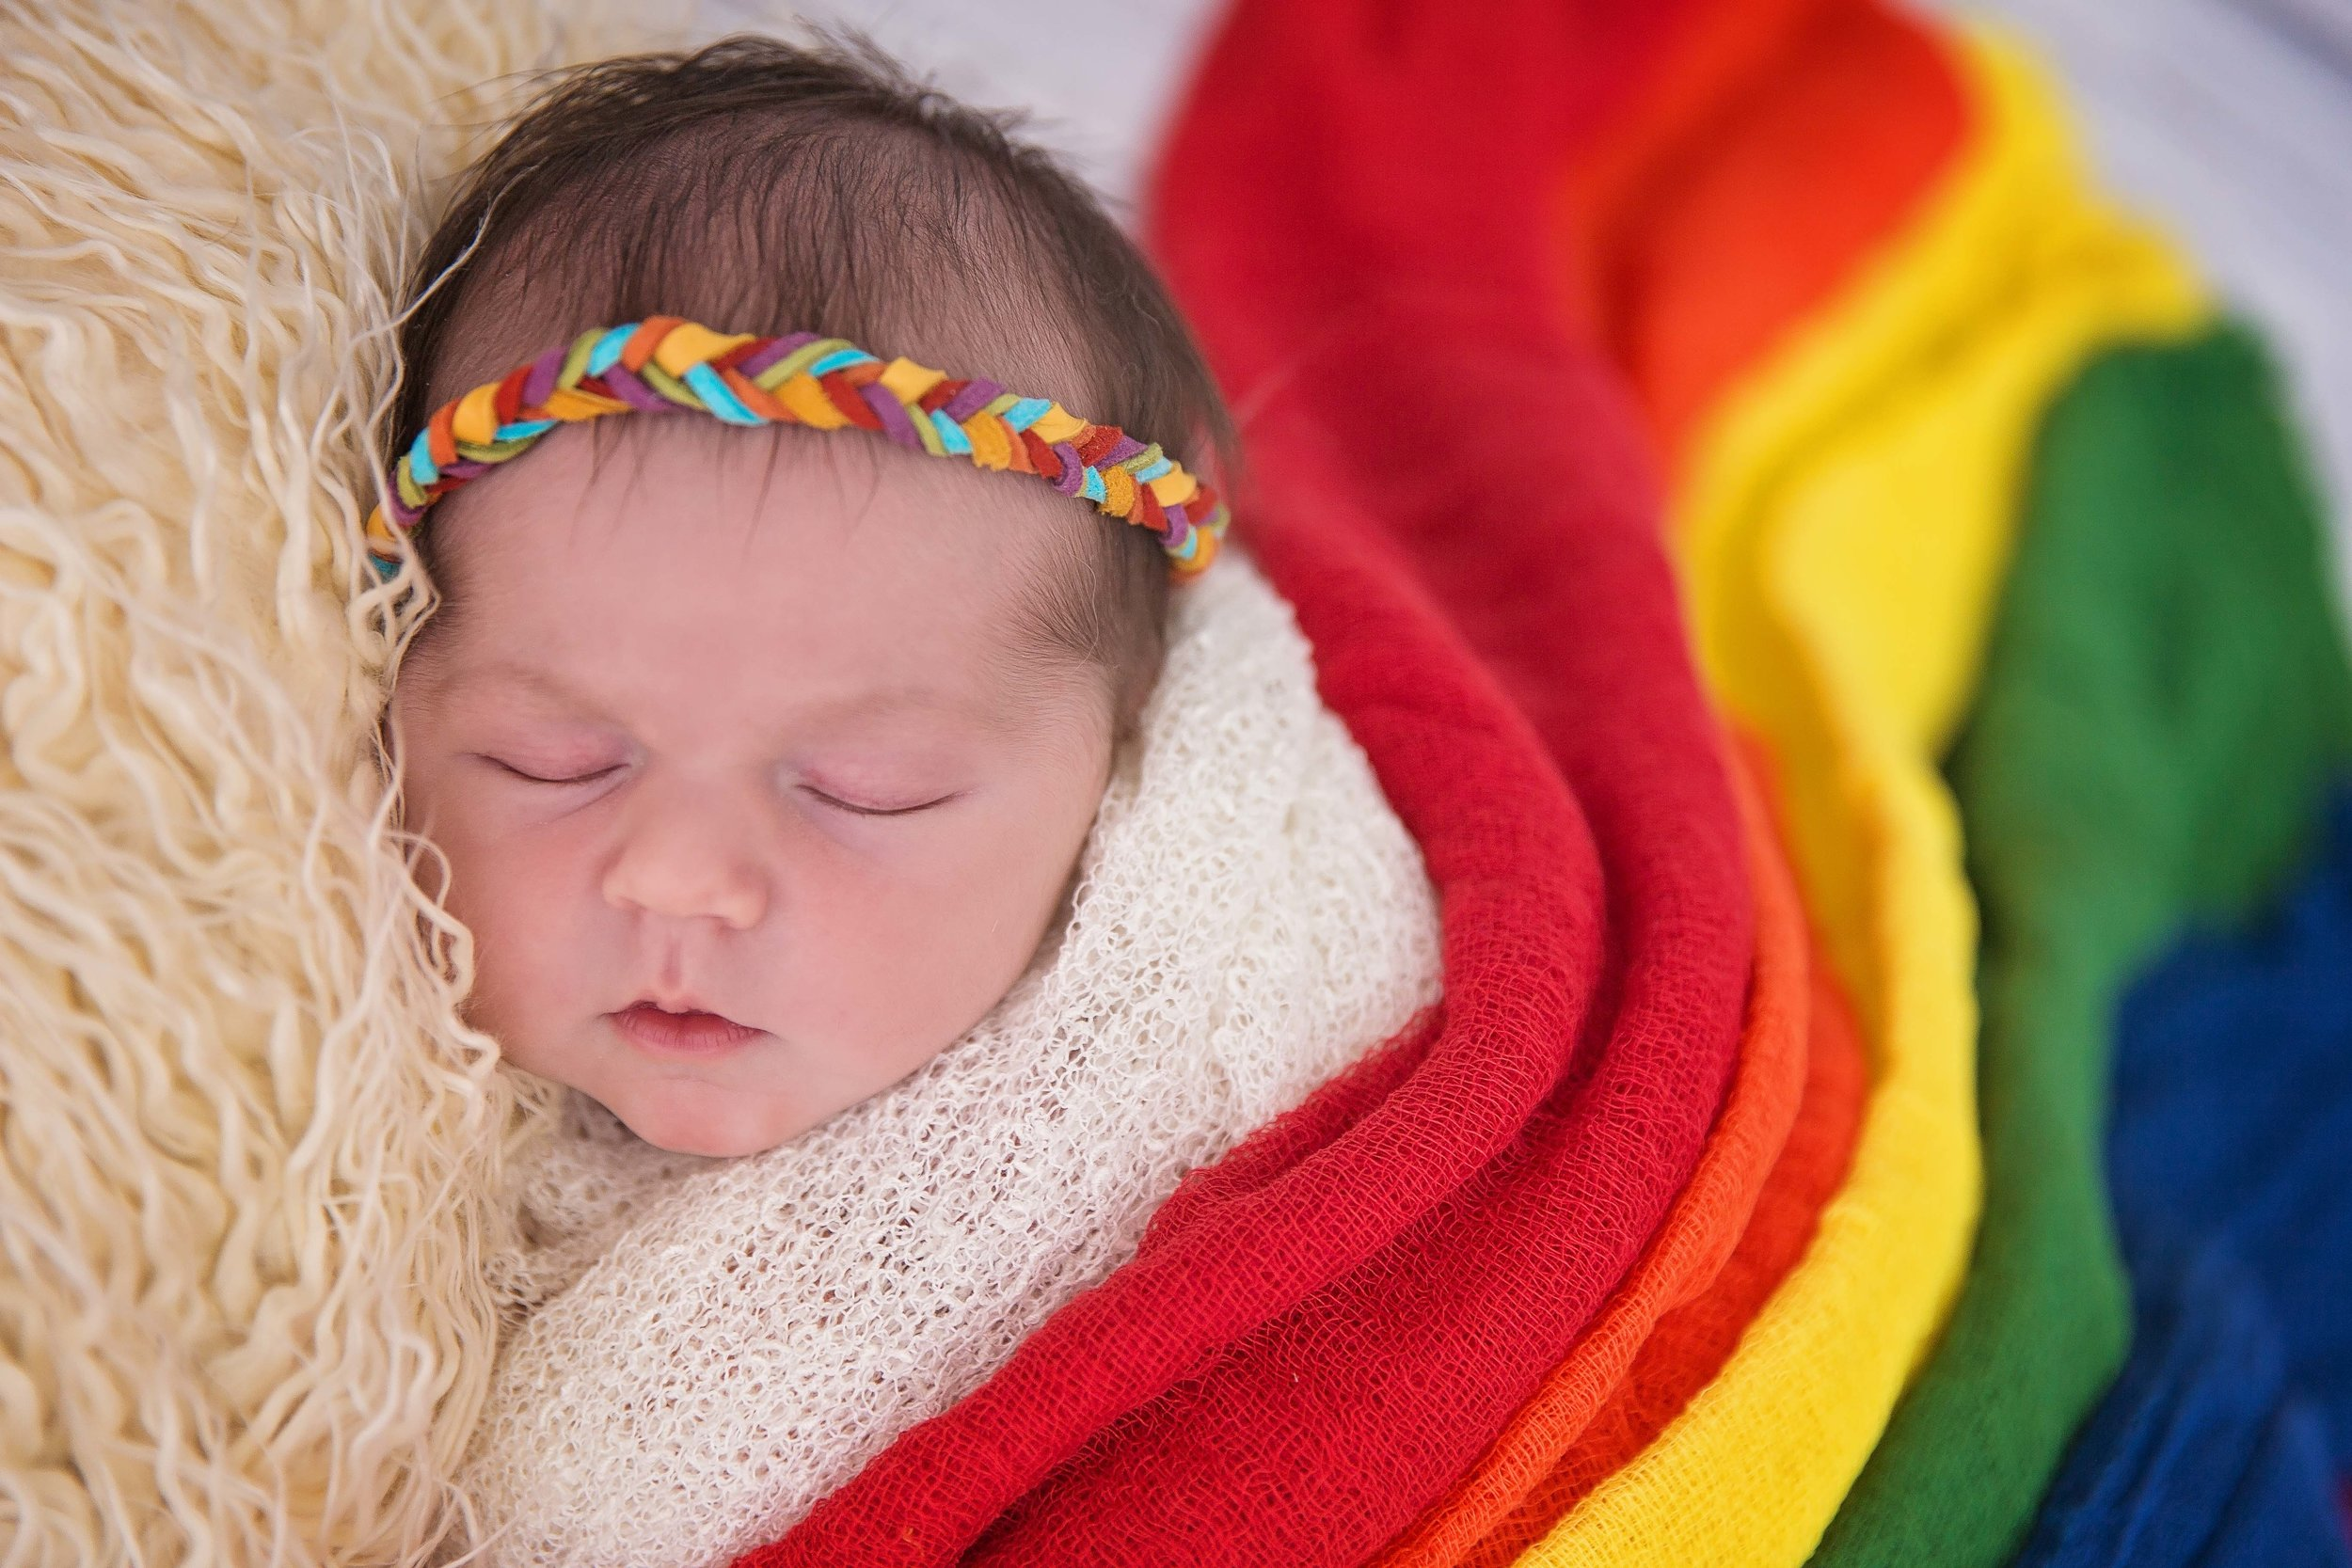 rainbow baby newborn photography fort leoanrd wood missouri